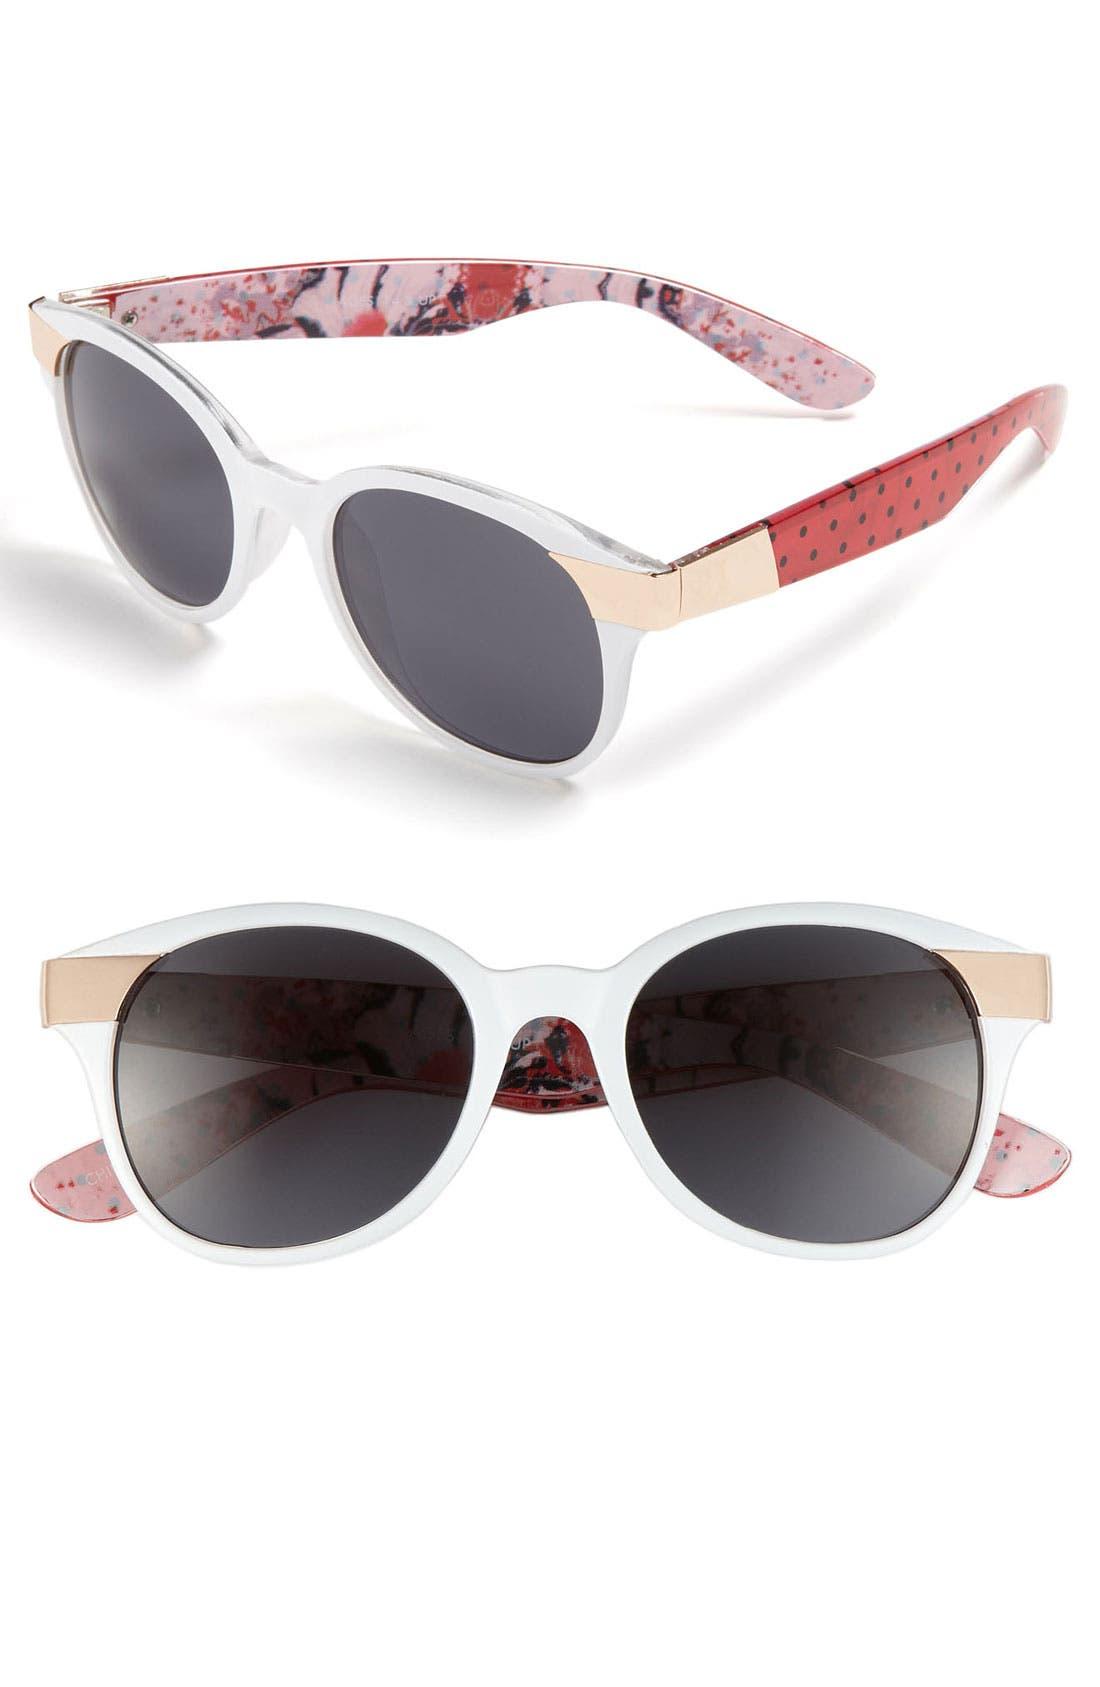 Alternate Image 1 Selected - FE NY 'Cadillac Ranch' Sunglasses